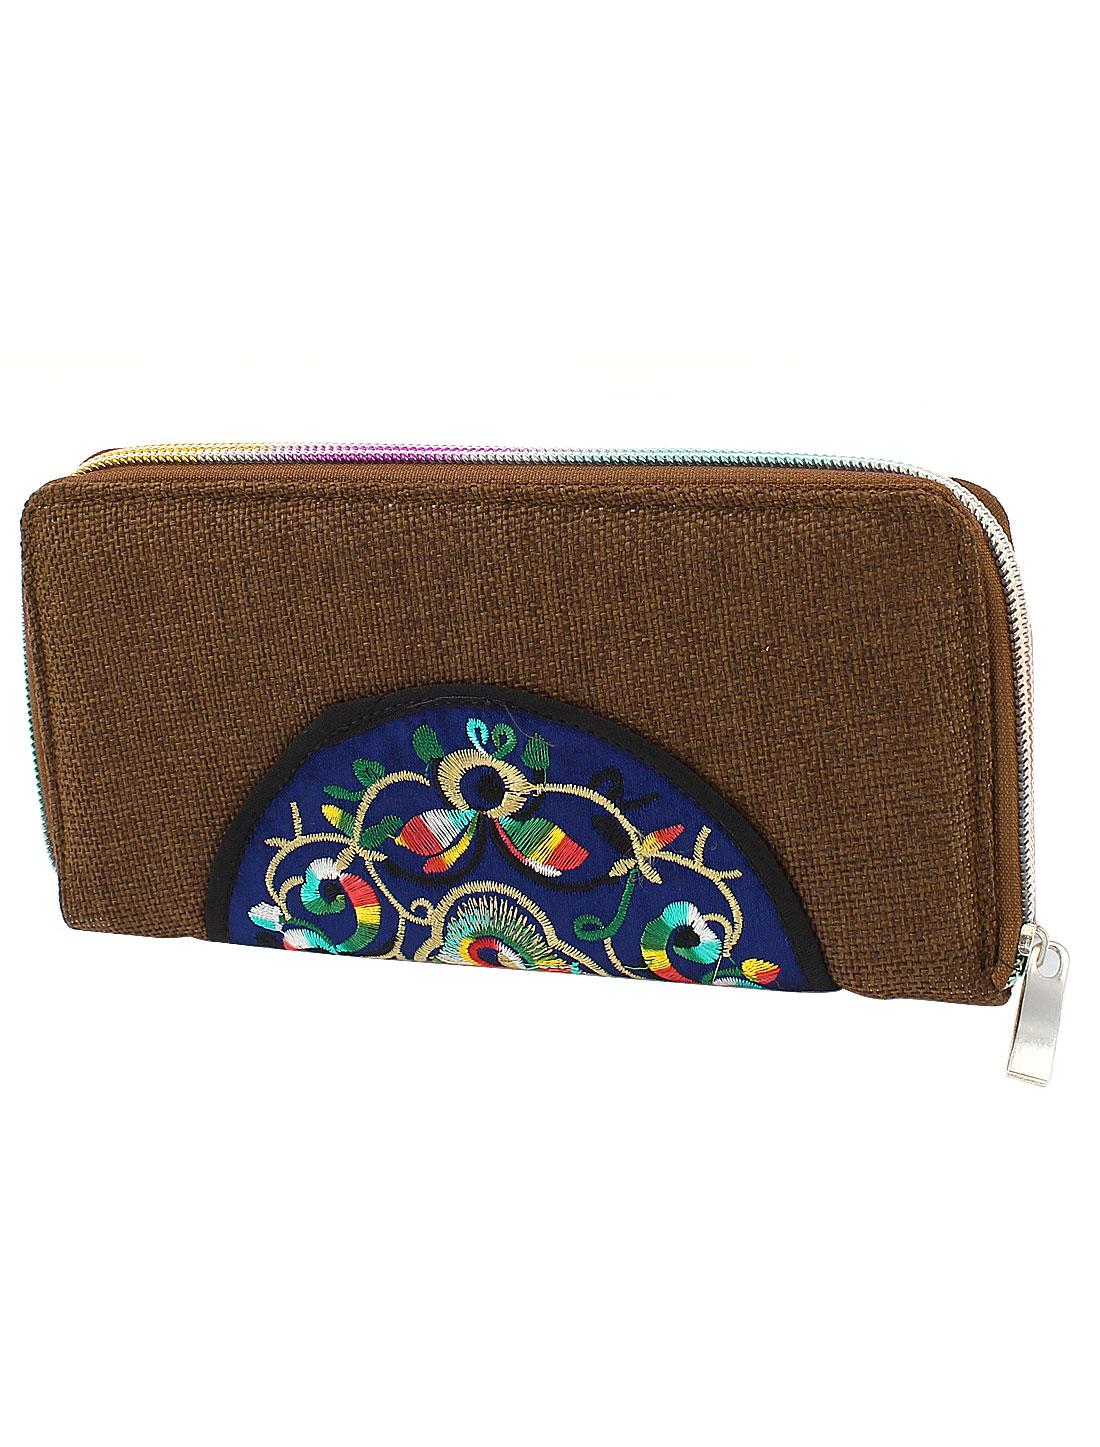 Coffee Color Linen Rectangle Design Floral Pattern Zipper Closure Wallet Purse for Ladies